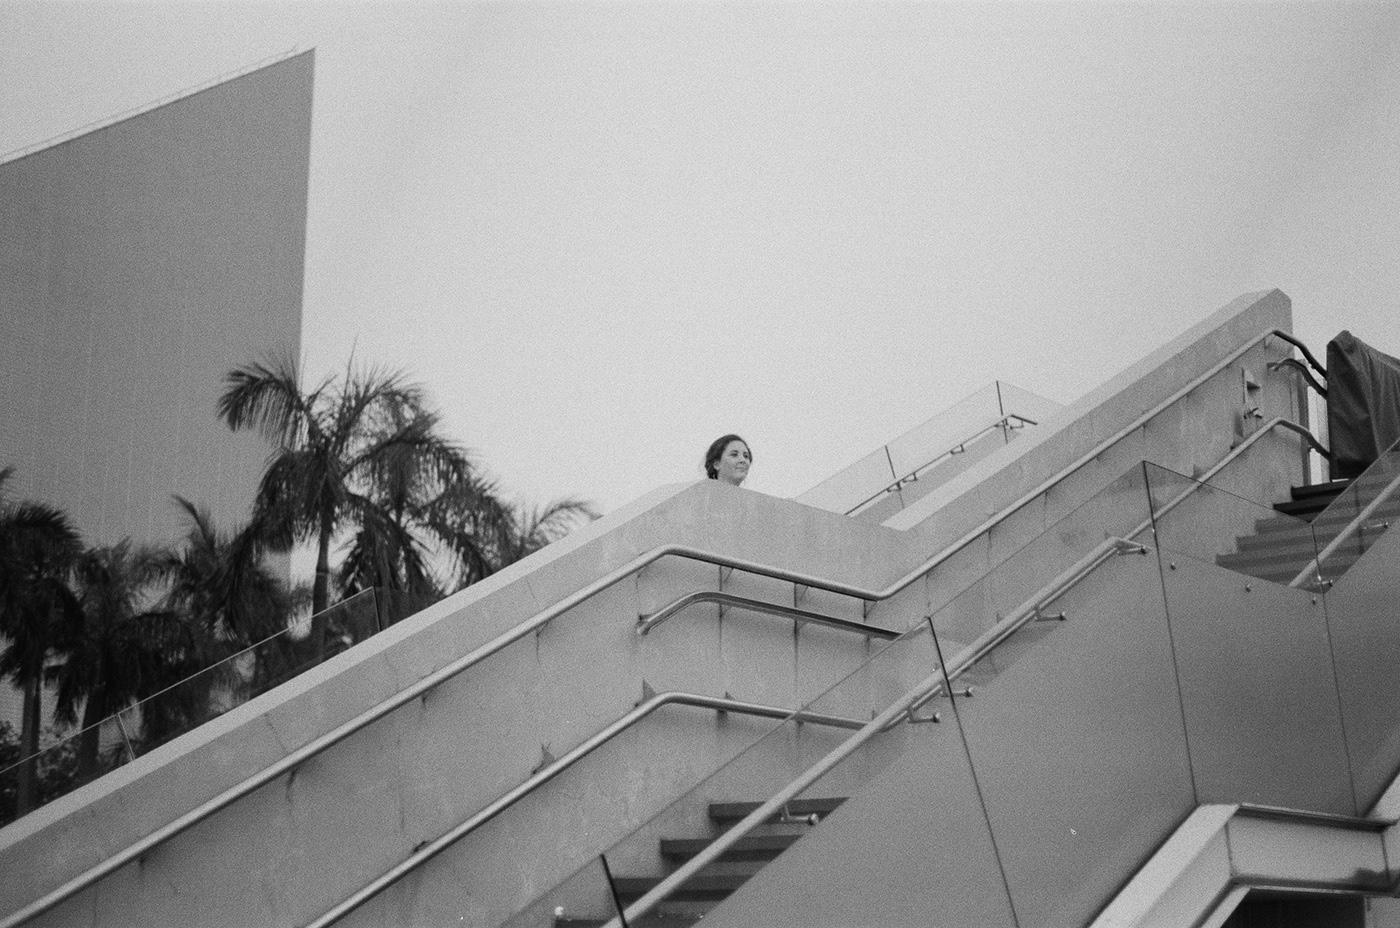 black and white city scape harbor Hong Kong Landscape portrait photography street photography